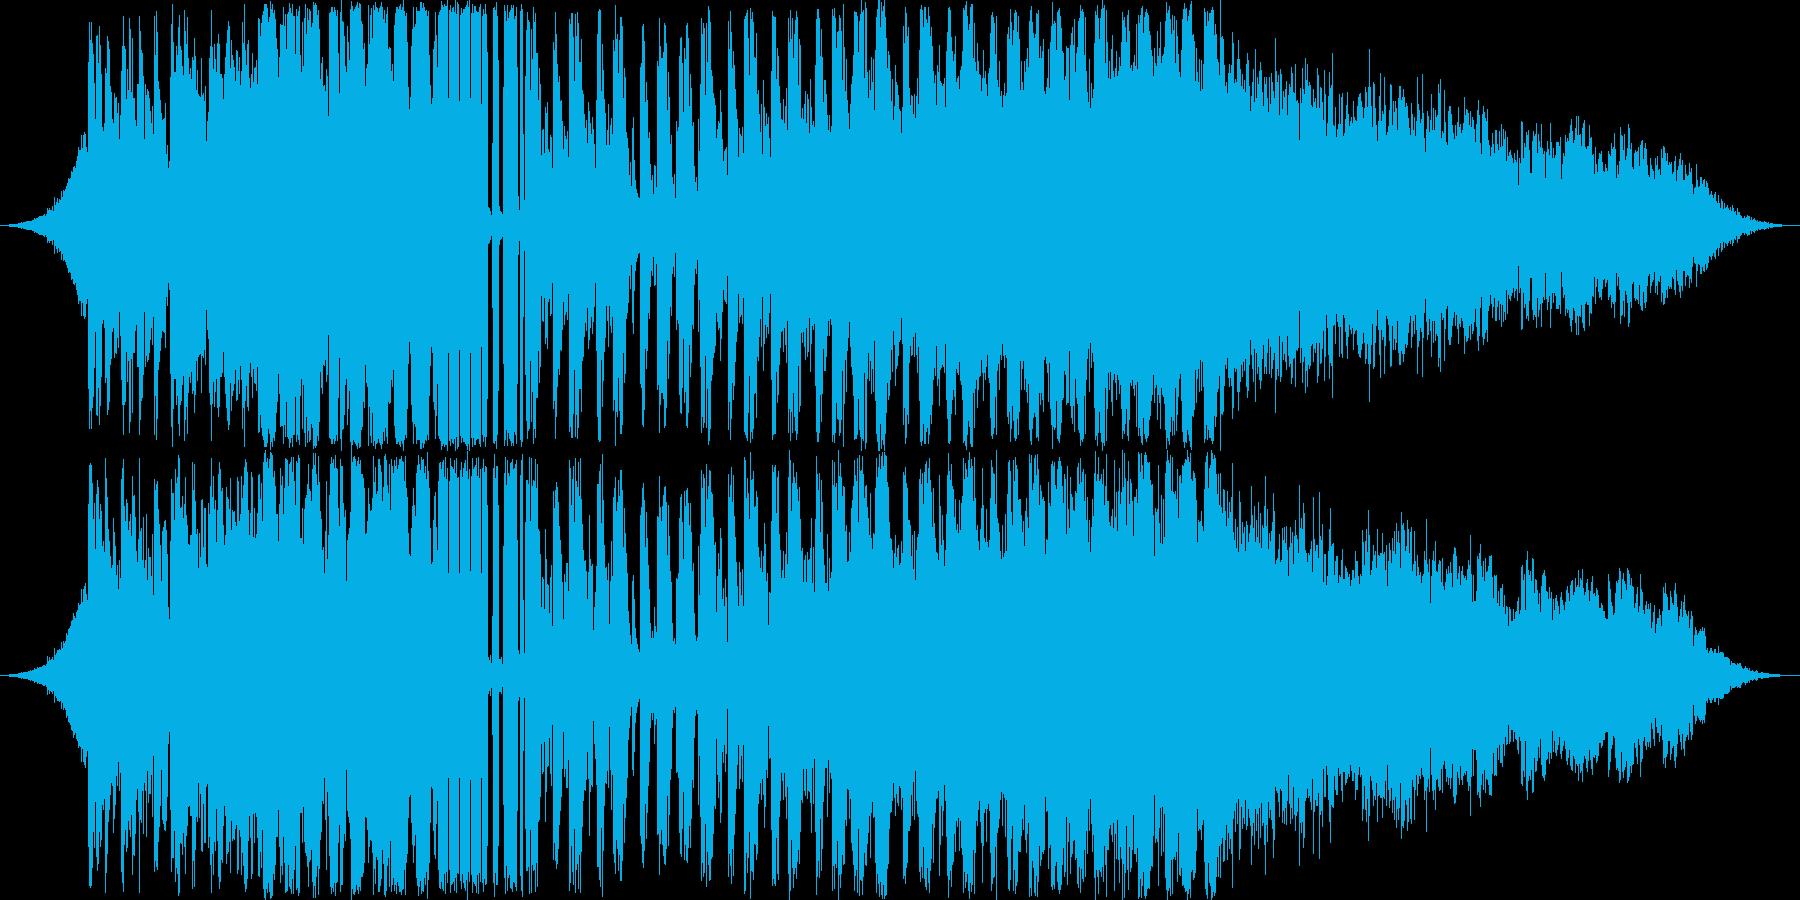 Neptuneのスピンオフ楽曲になりま…の再生済みの波形